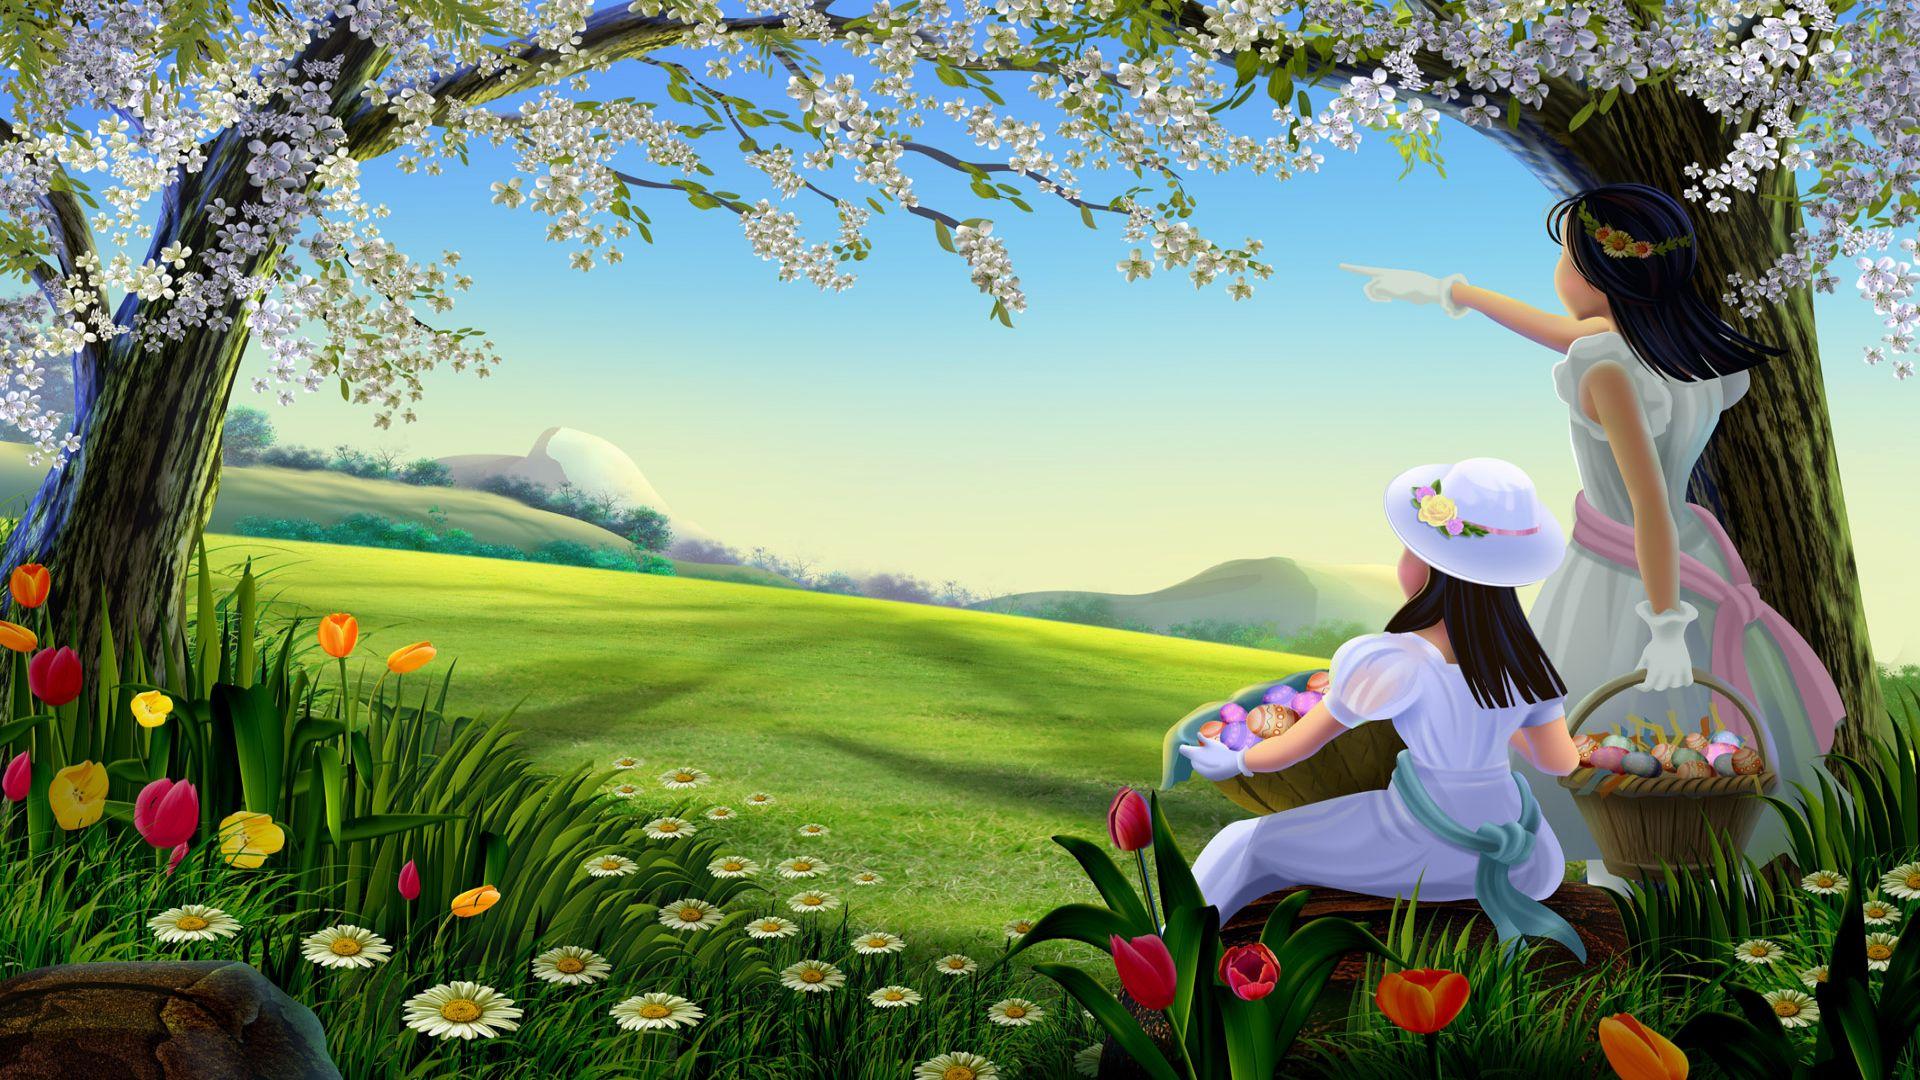 Latest Cartoons HD Wallpaper Free Download-